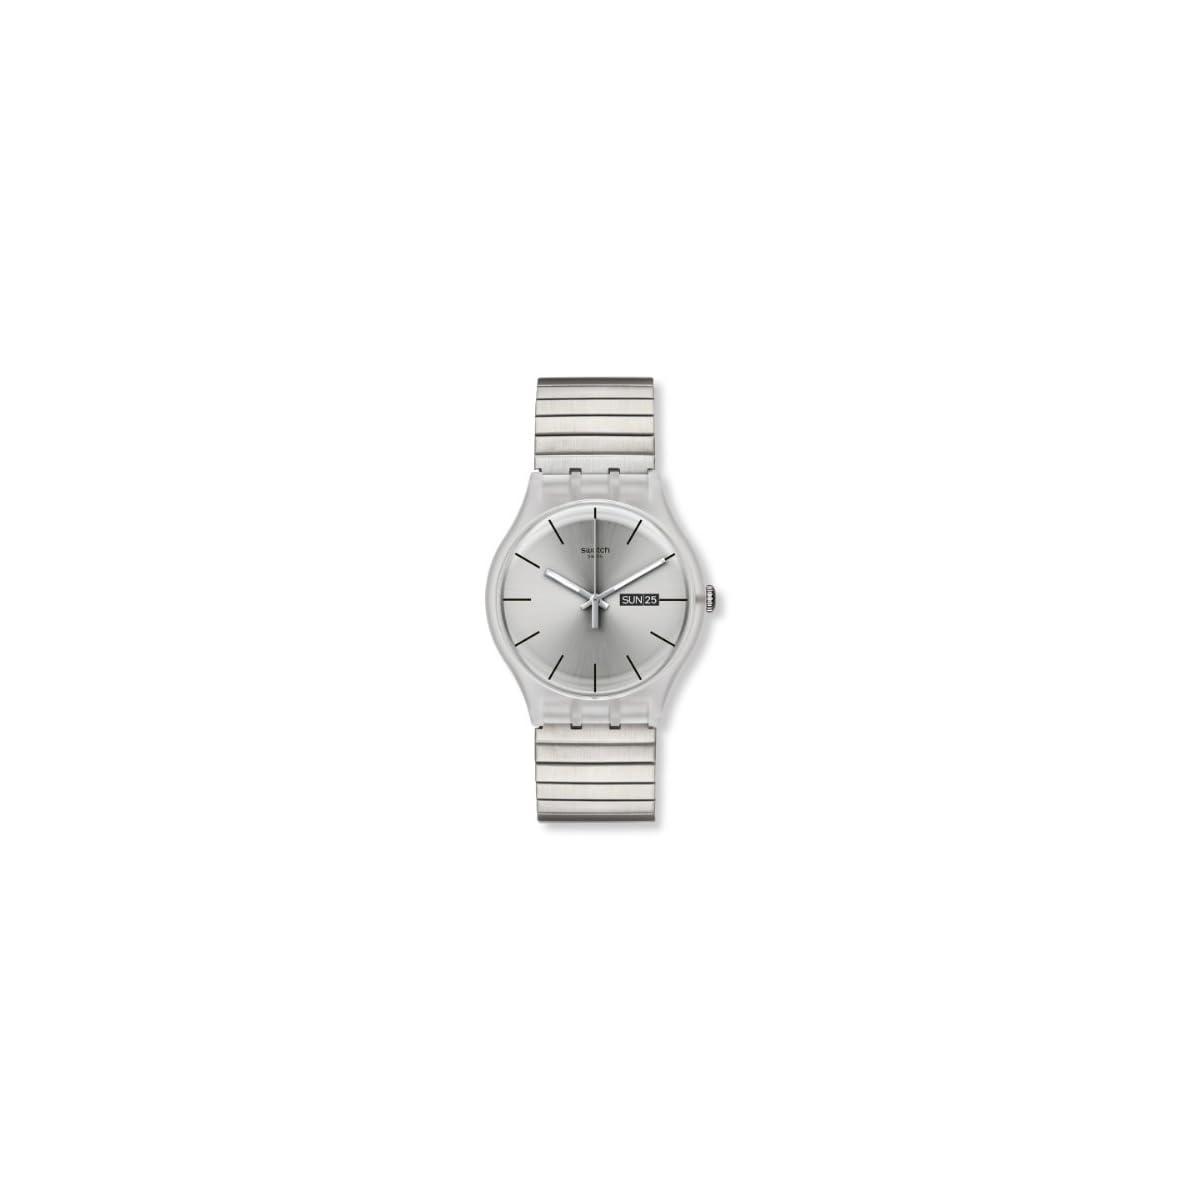 415wfXv7CZL. SS1200  - Swatch SUOK700B - Reloj analógico Unisex de Acero Inoxidable Recubierto Plata